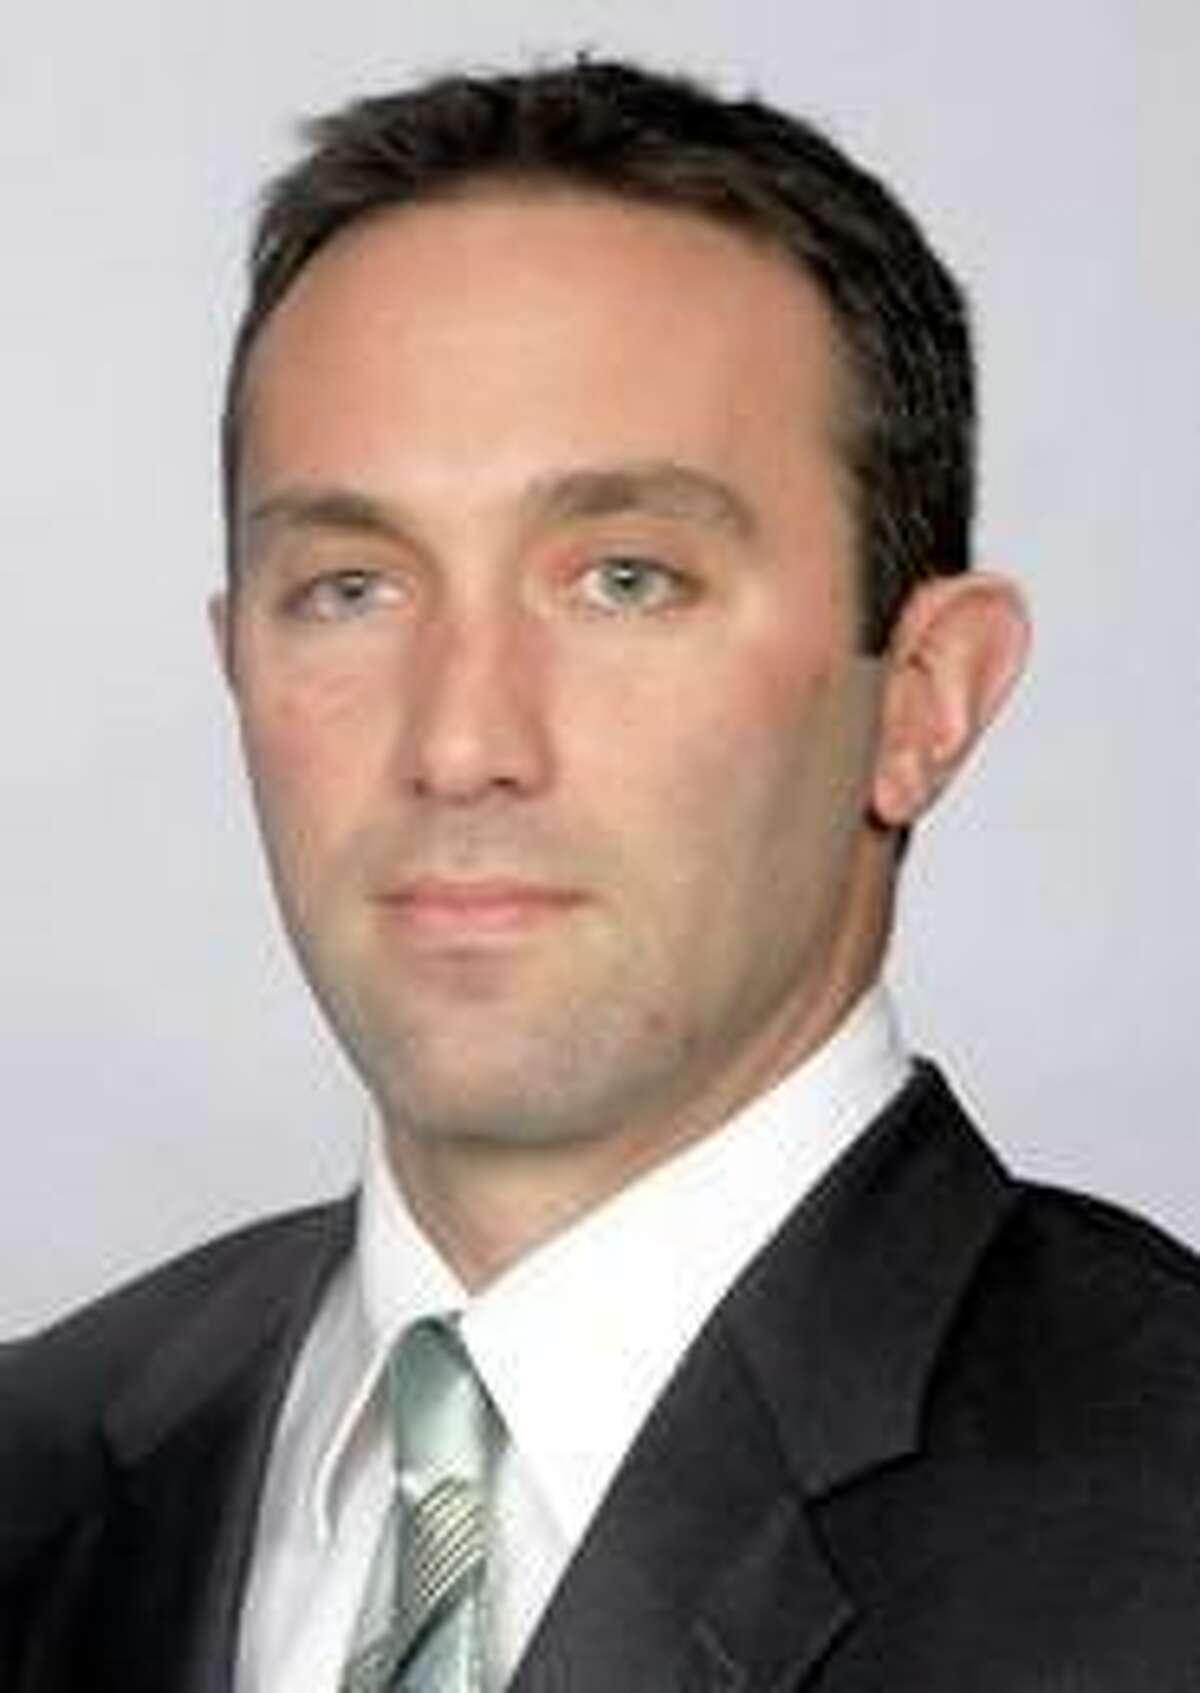 Former Hartford baseball coach Justin Blood, the new coach at Keene State.